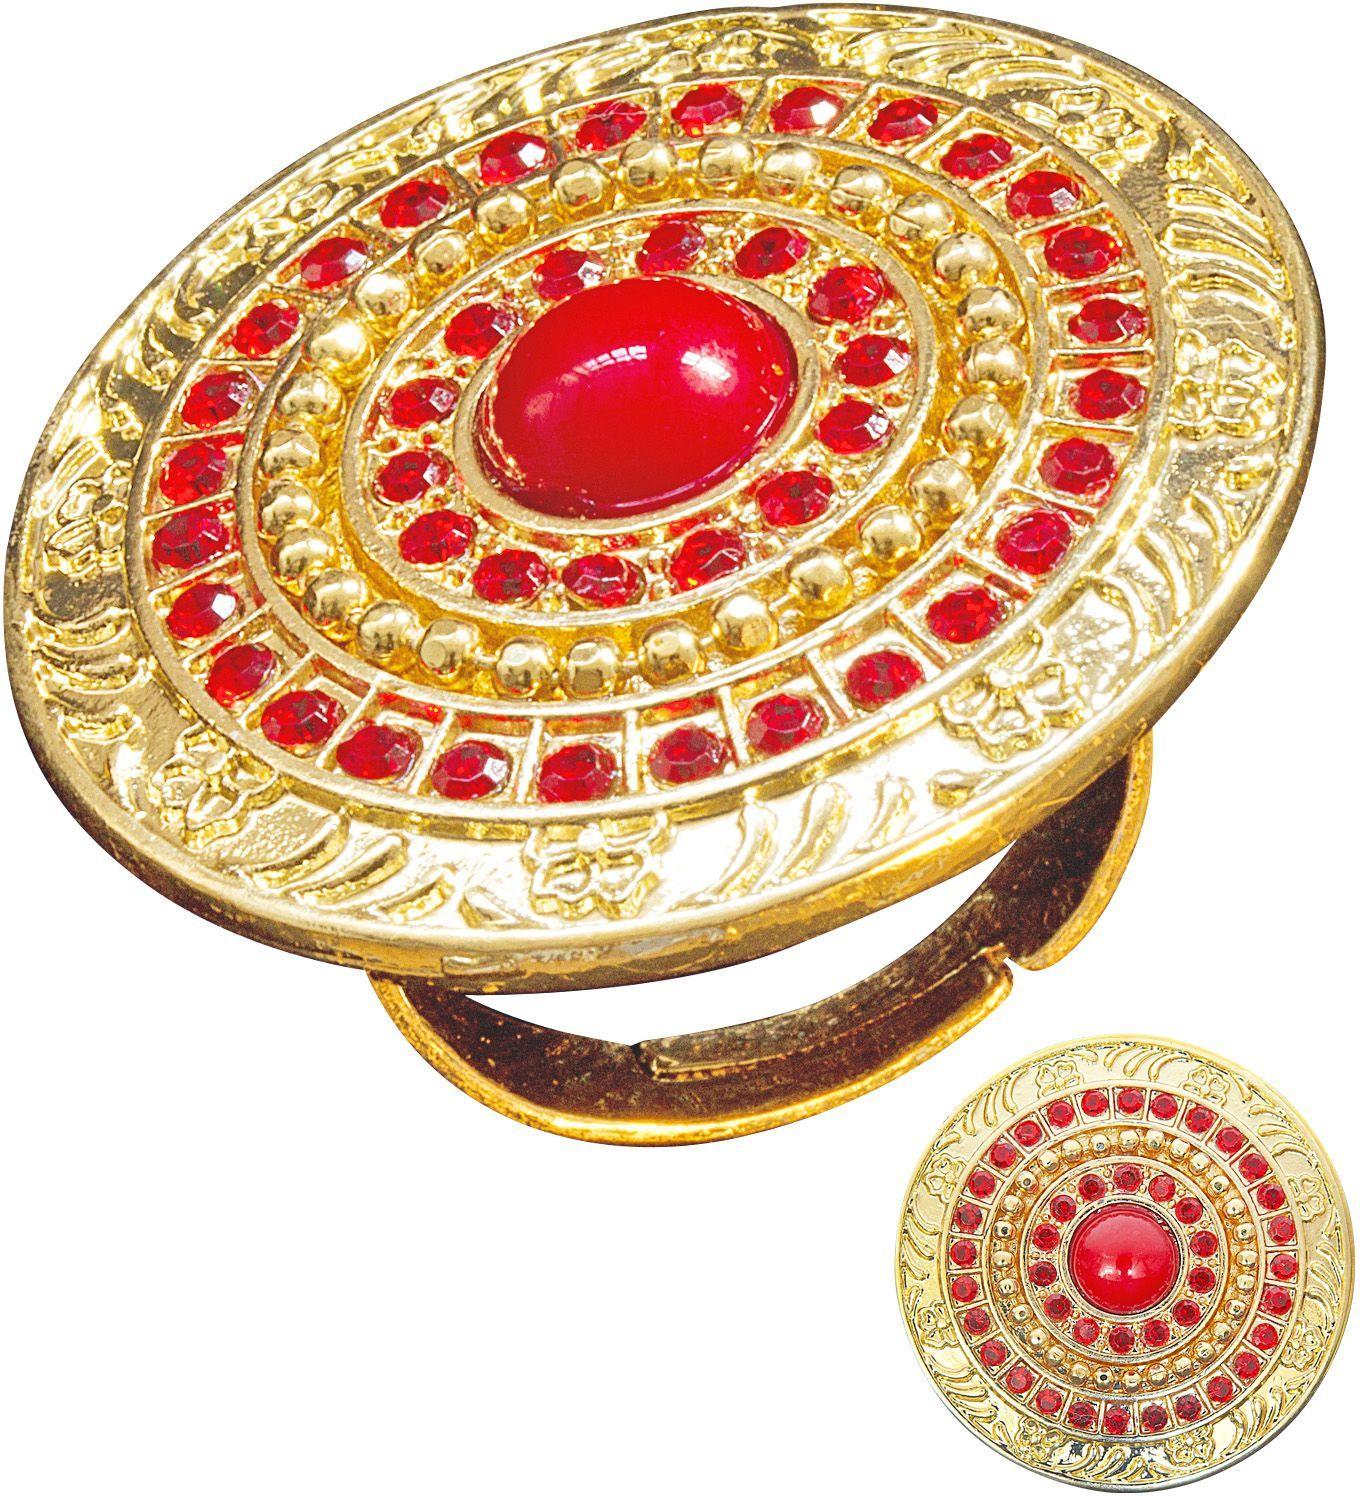 Romeinse ronde ring